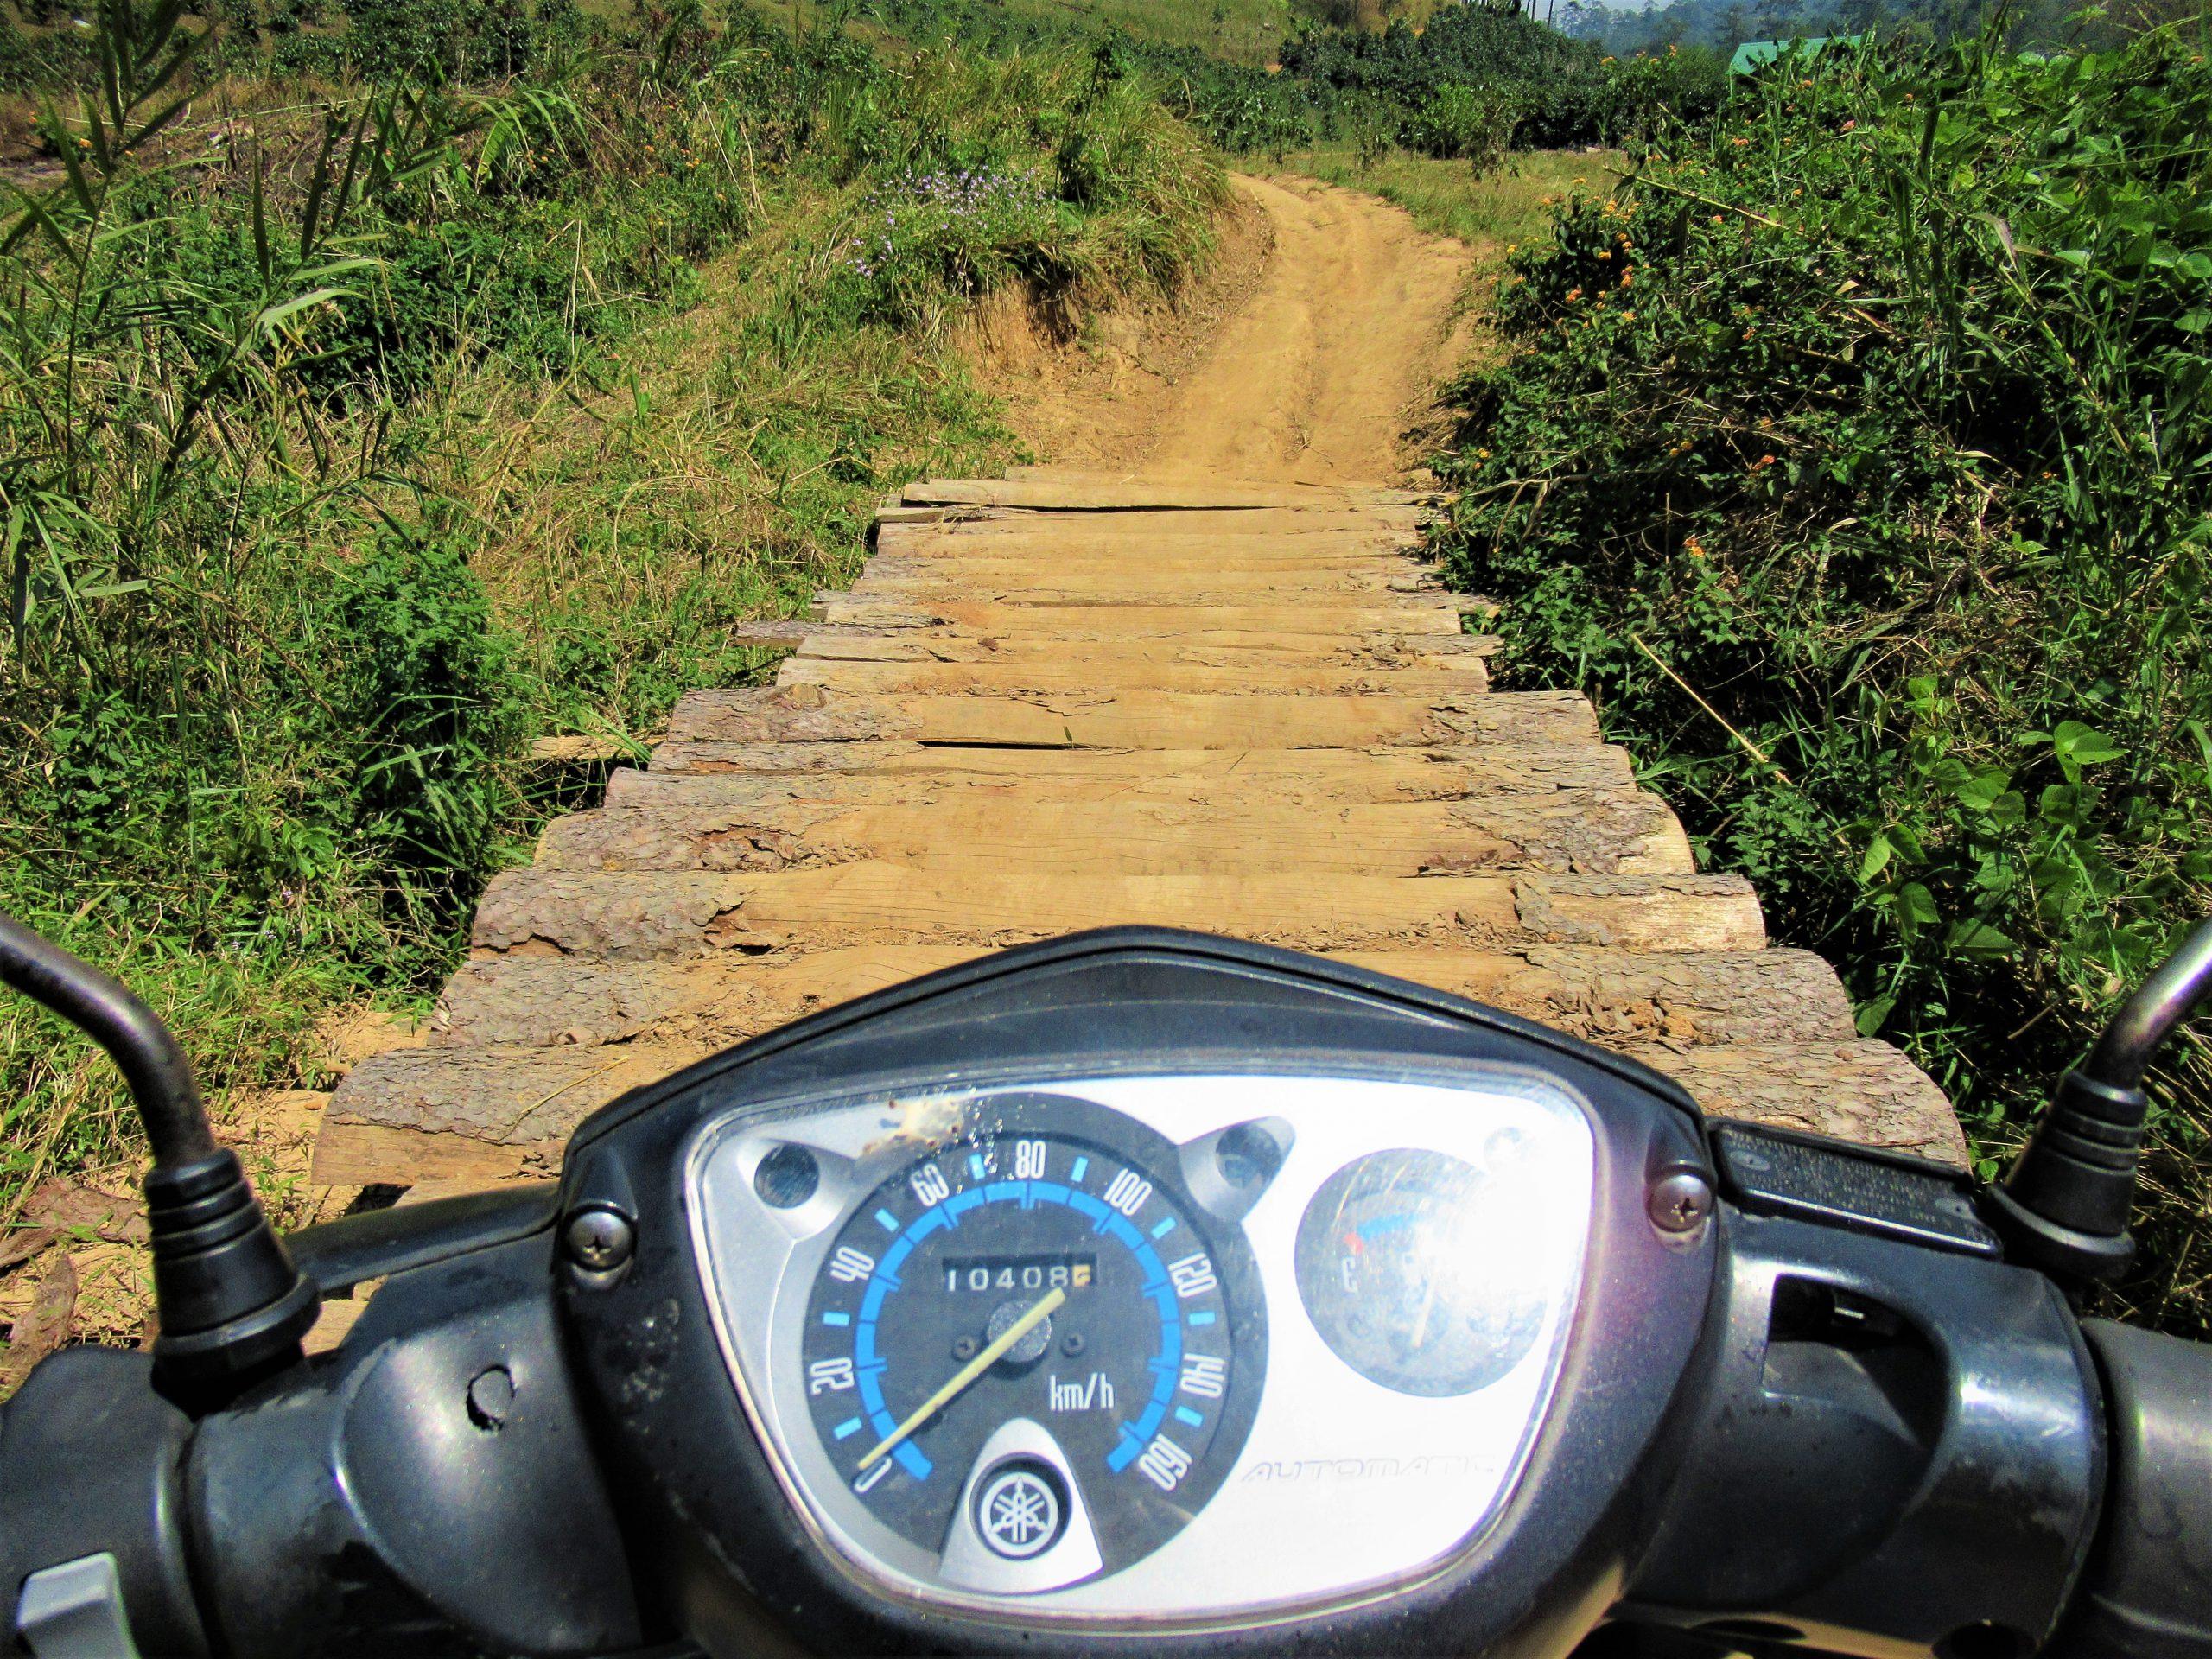 Wooden log bridge over a brook, motocamping in the Da Nhim pine forests, Central Highlands